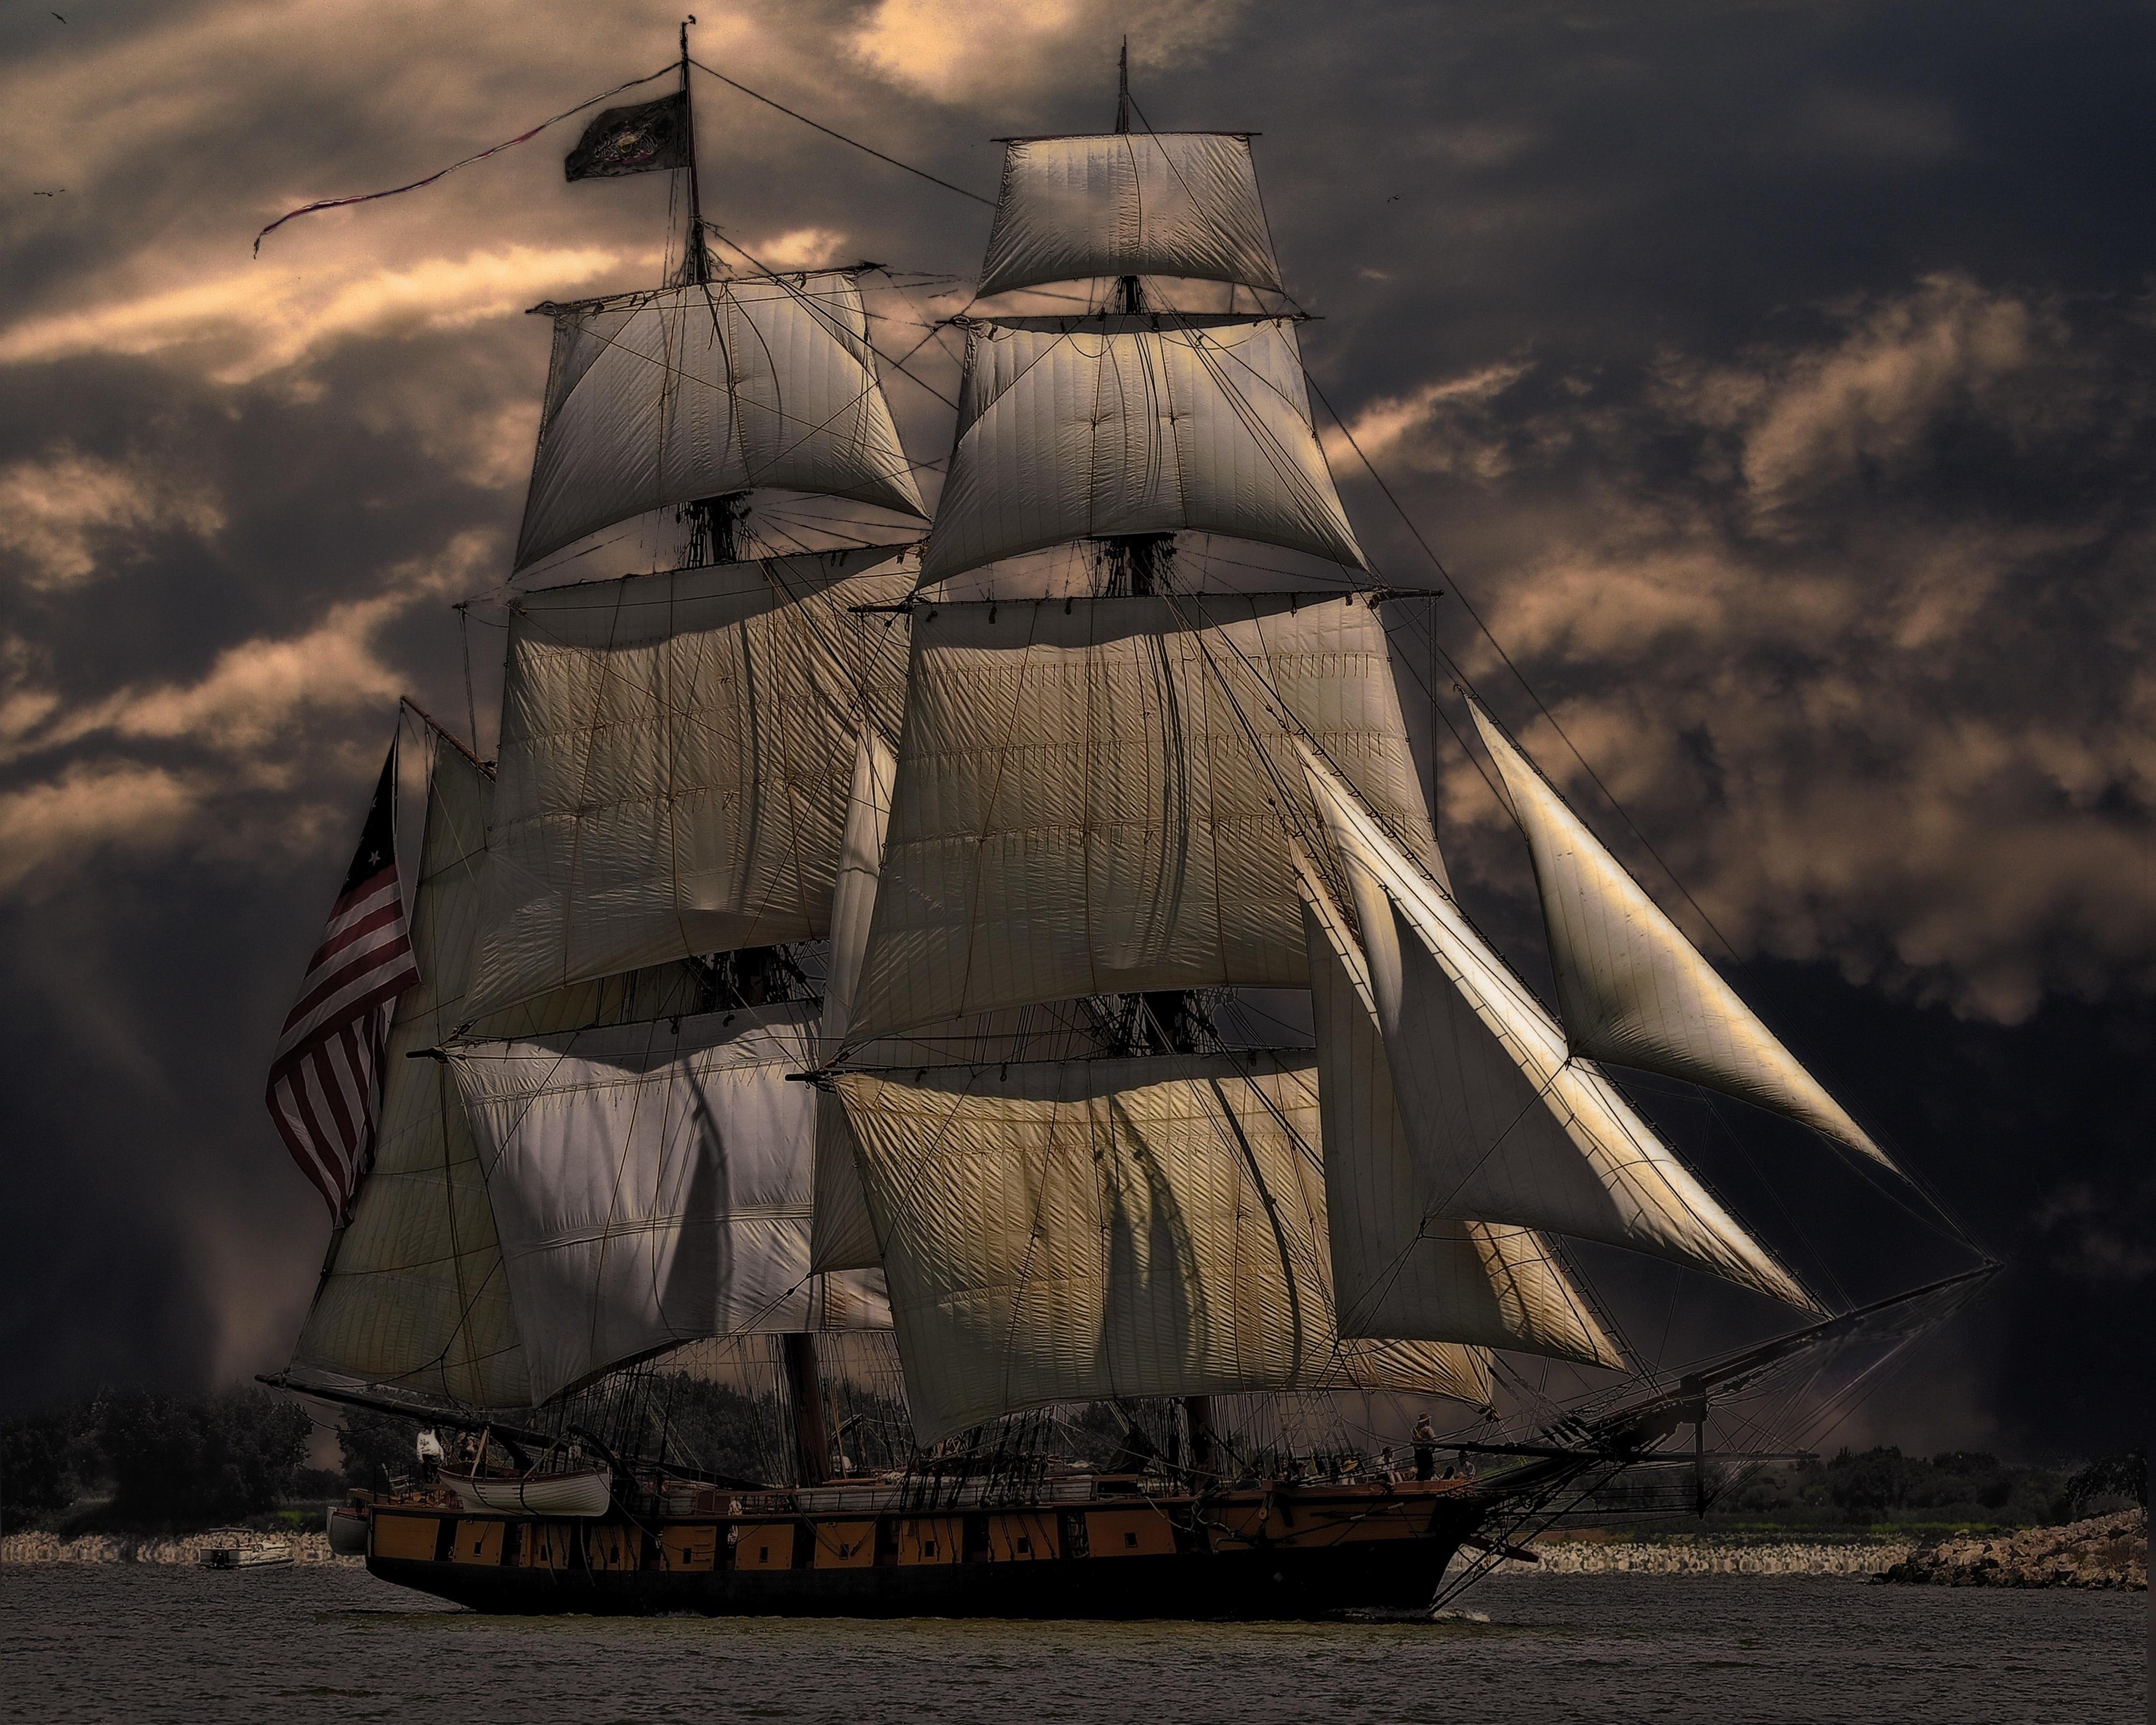 boat-maritime-mast-37859